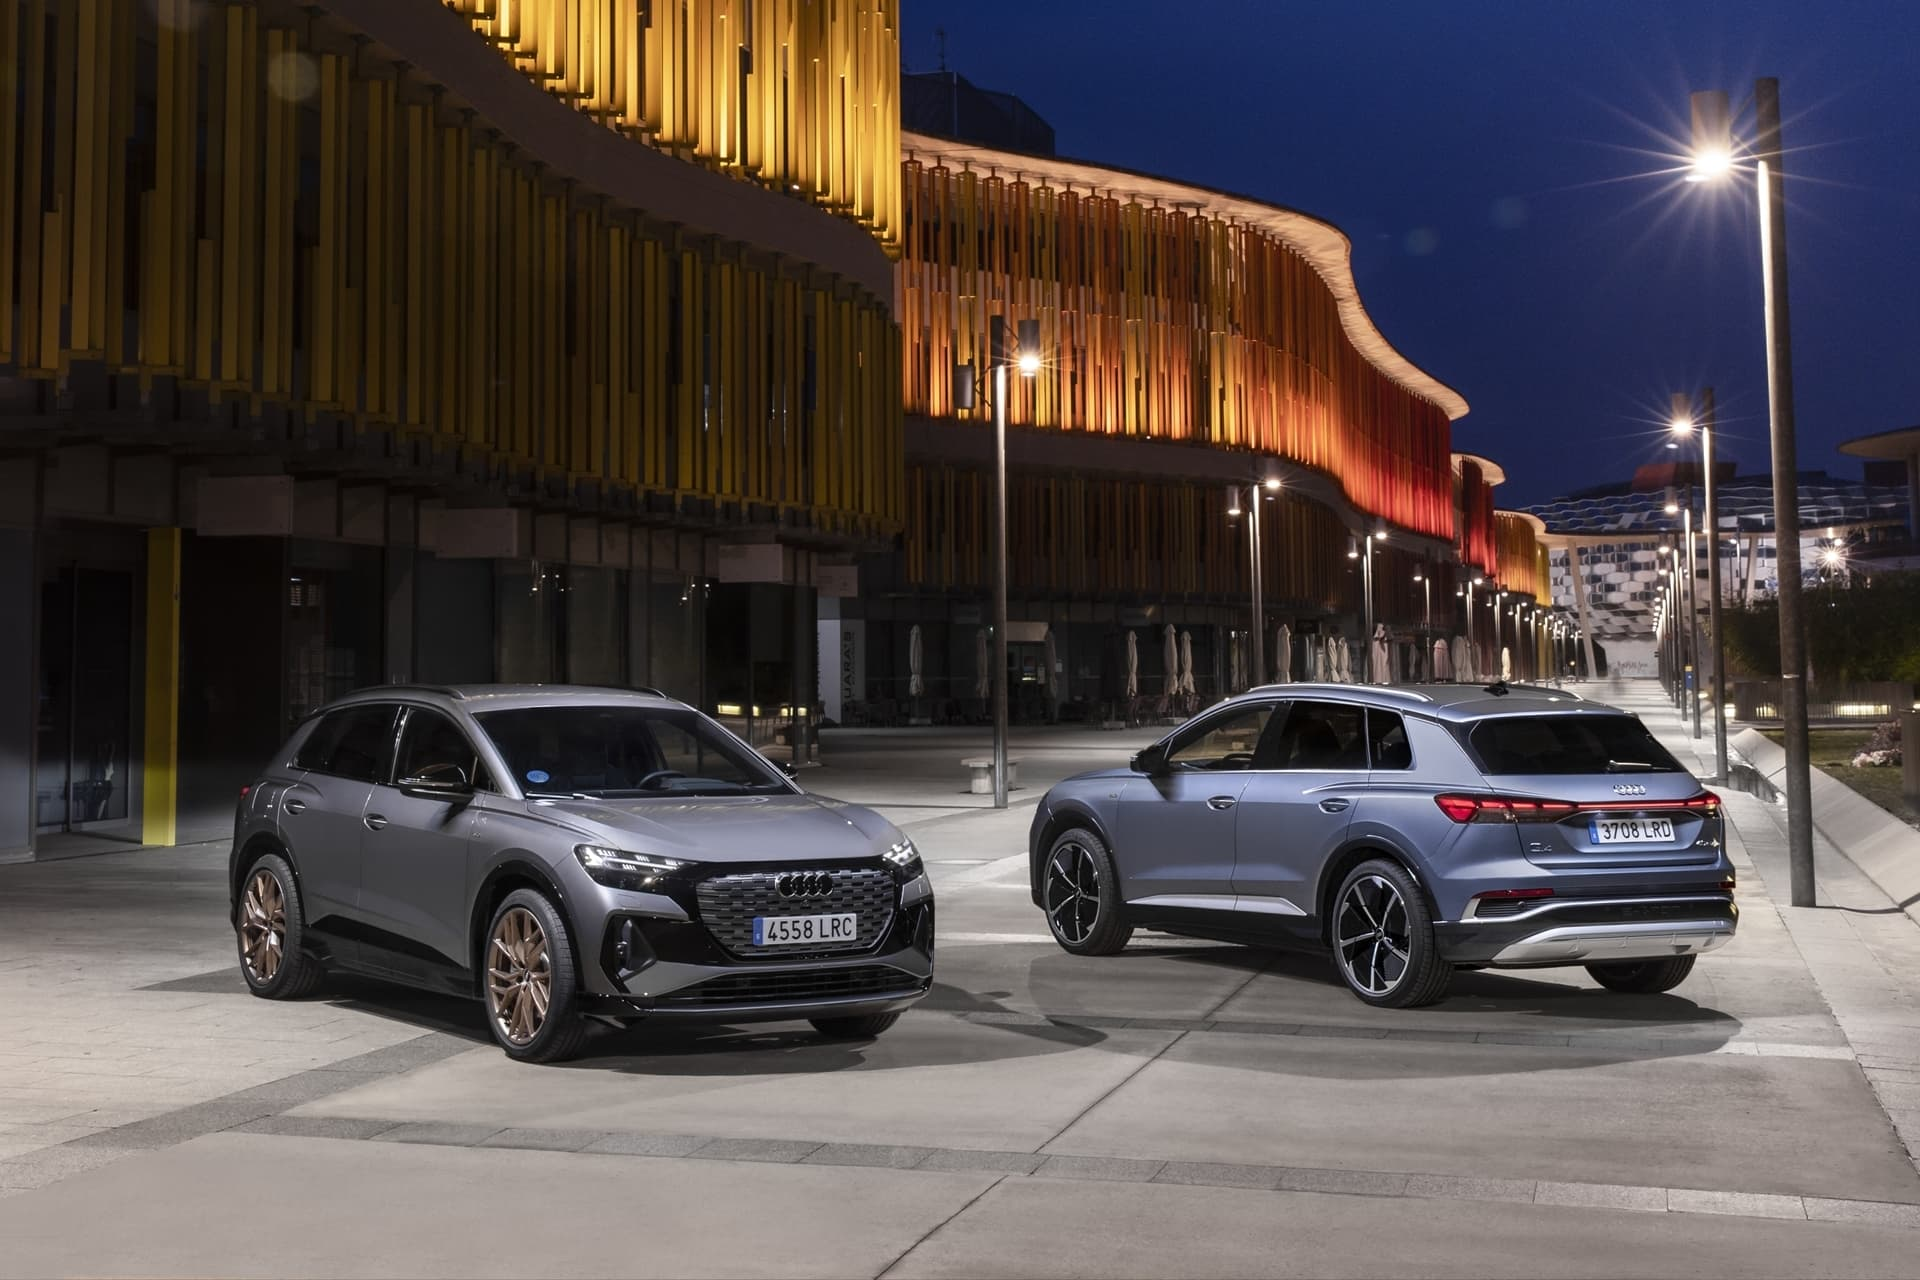 Audi Q4 E Tron 2021 0721 069